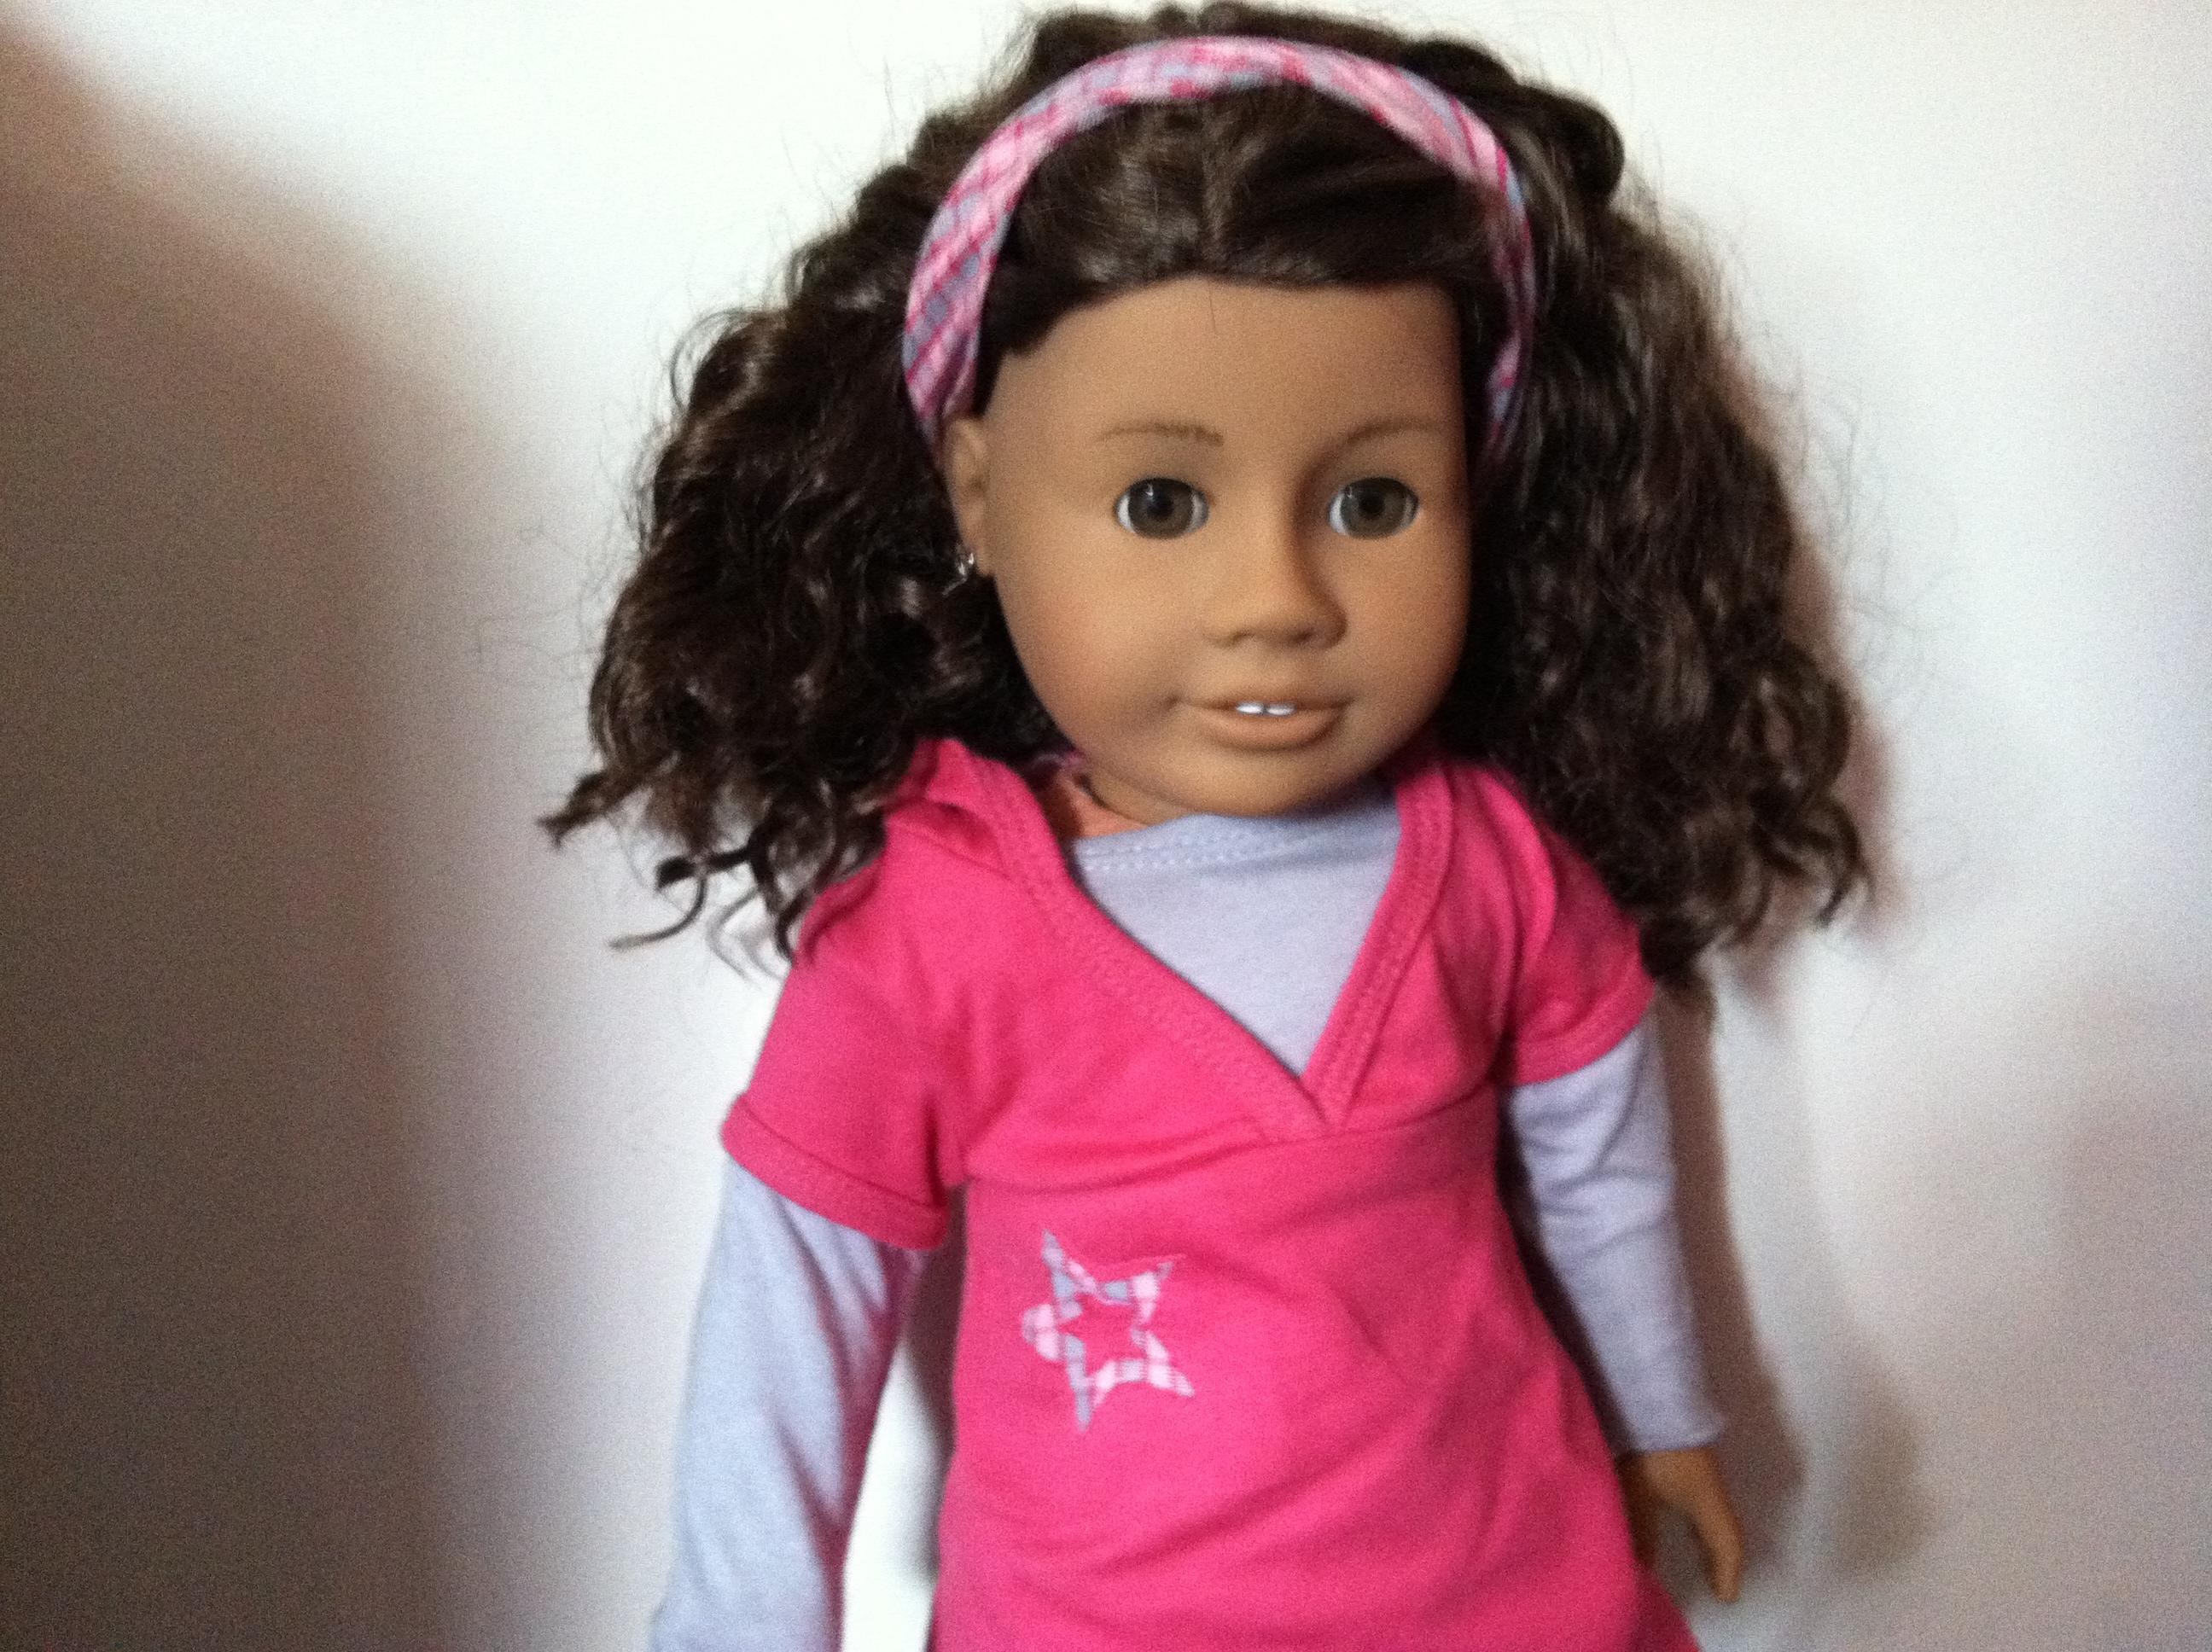 American Girl Doll Just Like You 23 | www.imgkid.com - The ...